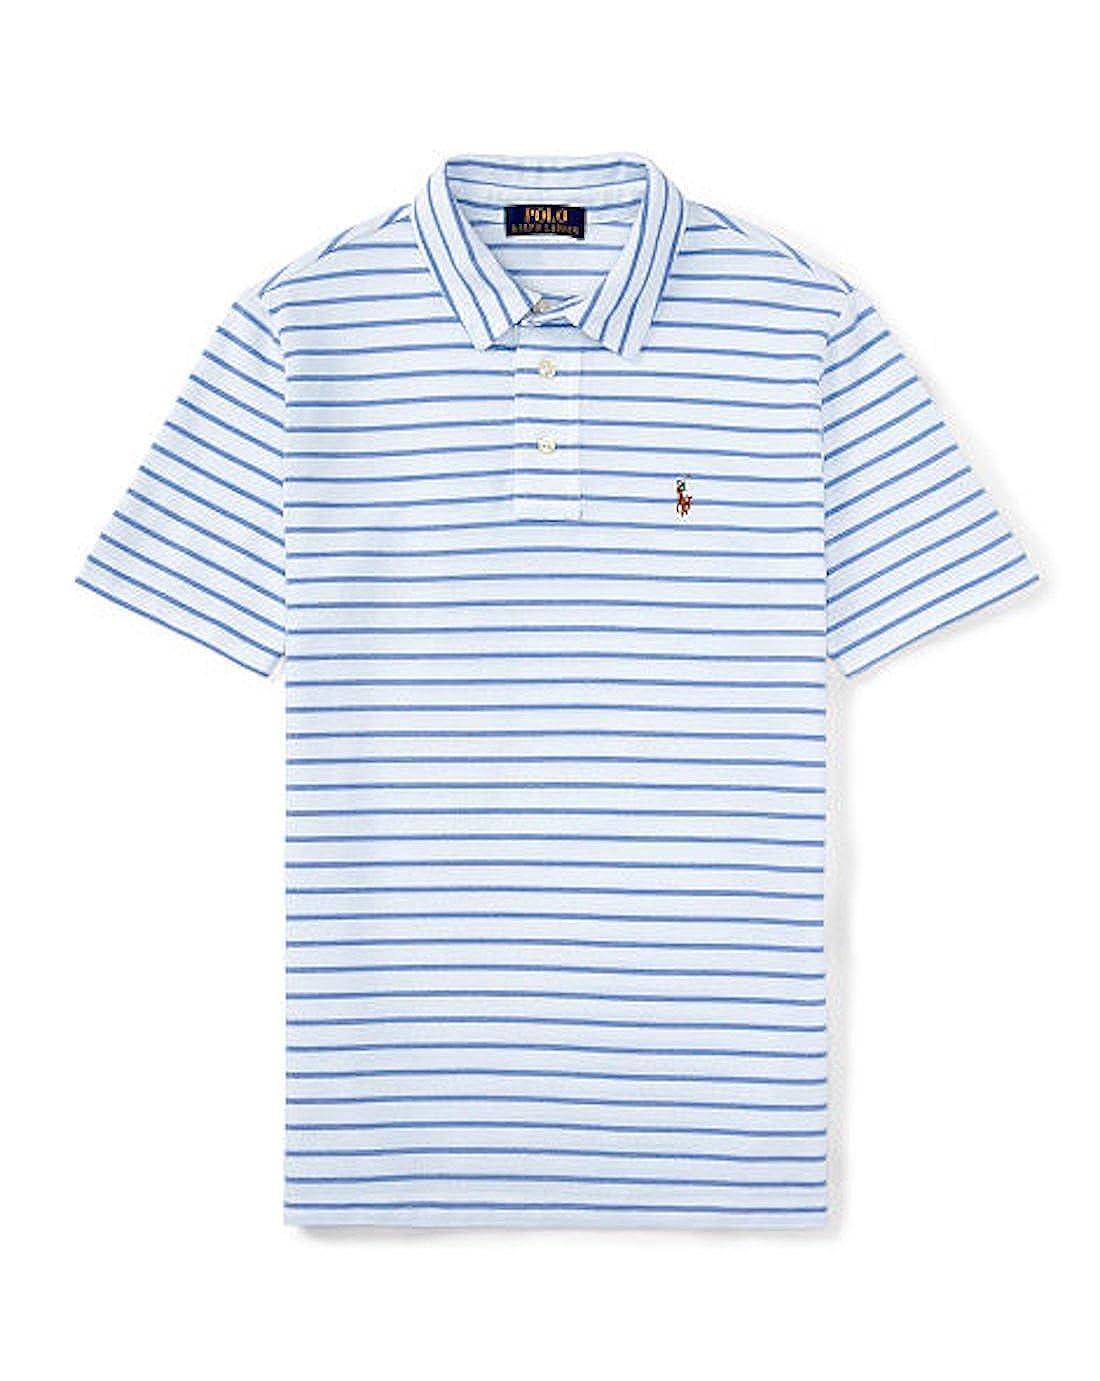 Polo Ralph Lauren Toddler Boy Short Sleeve Striped Polo Shirt White Multi